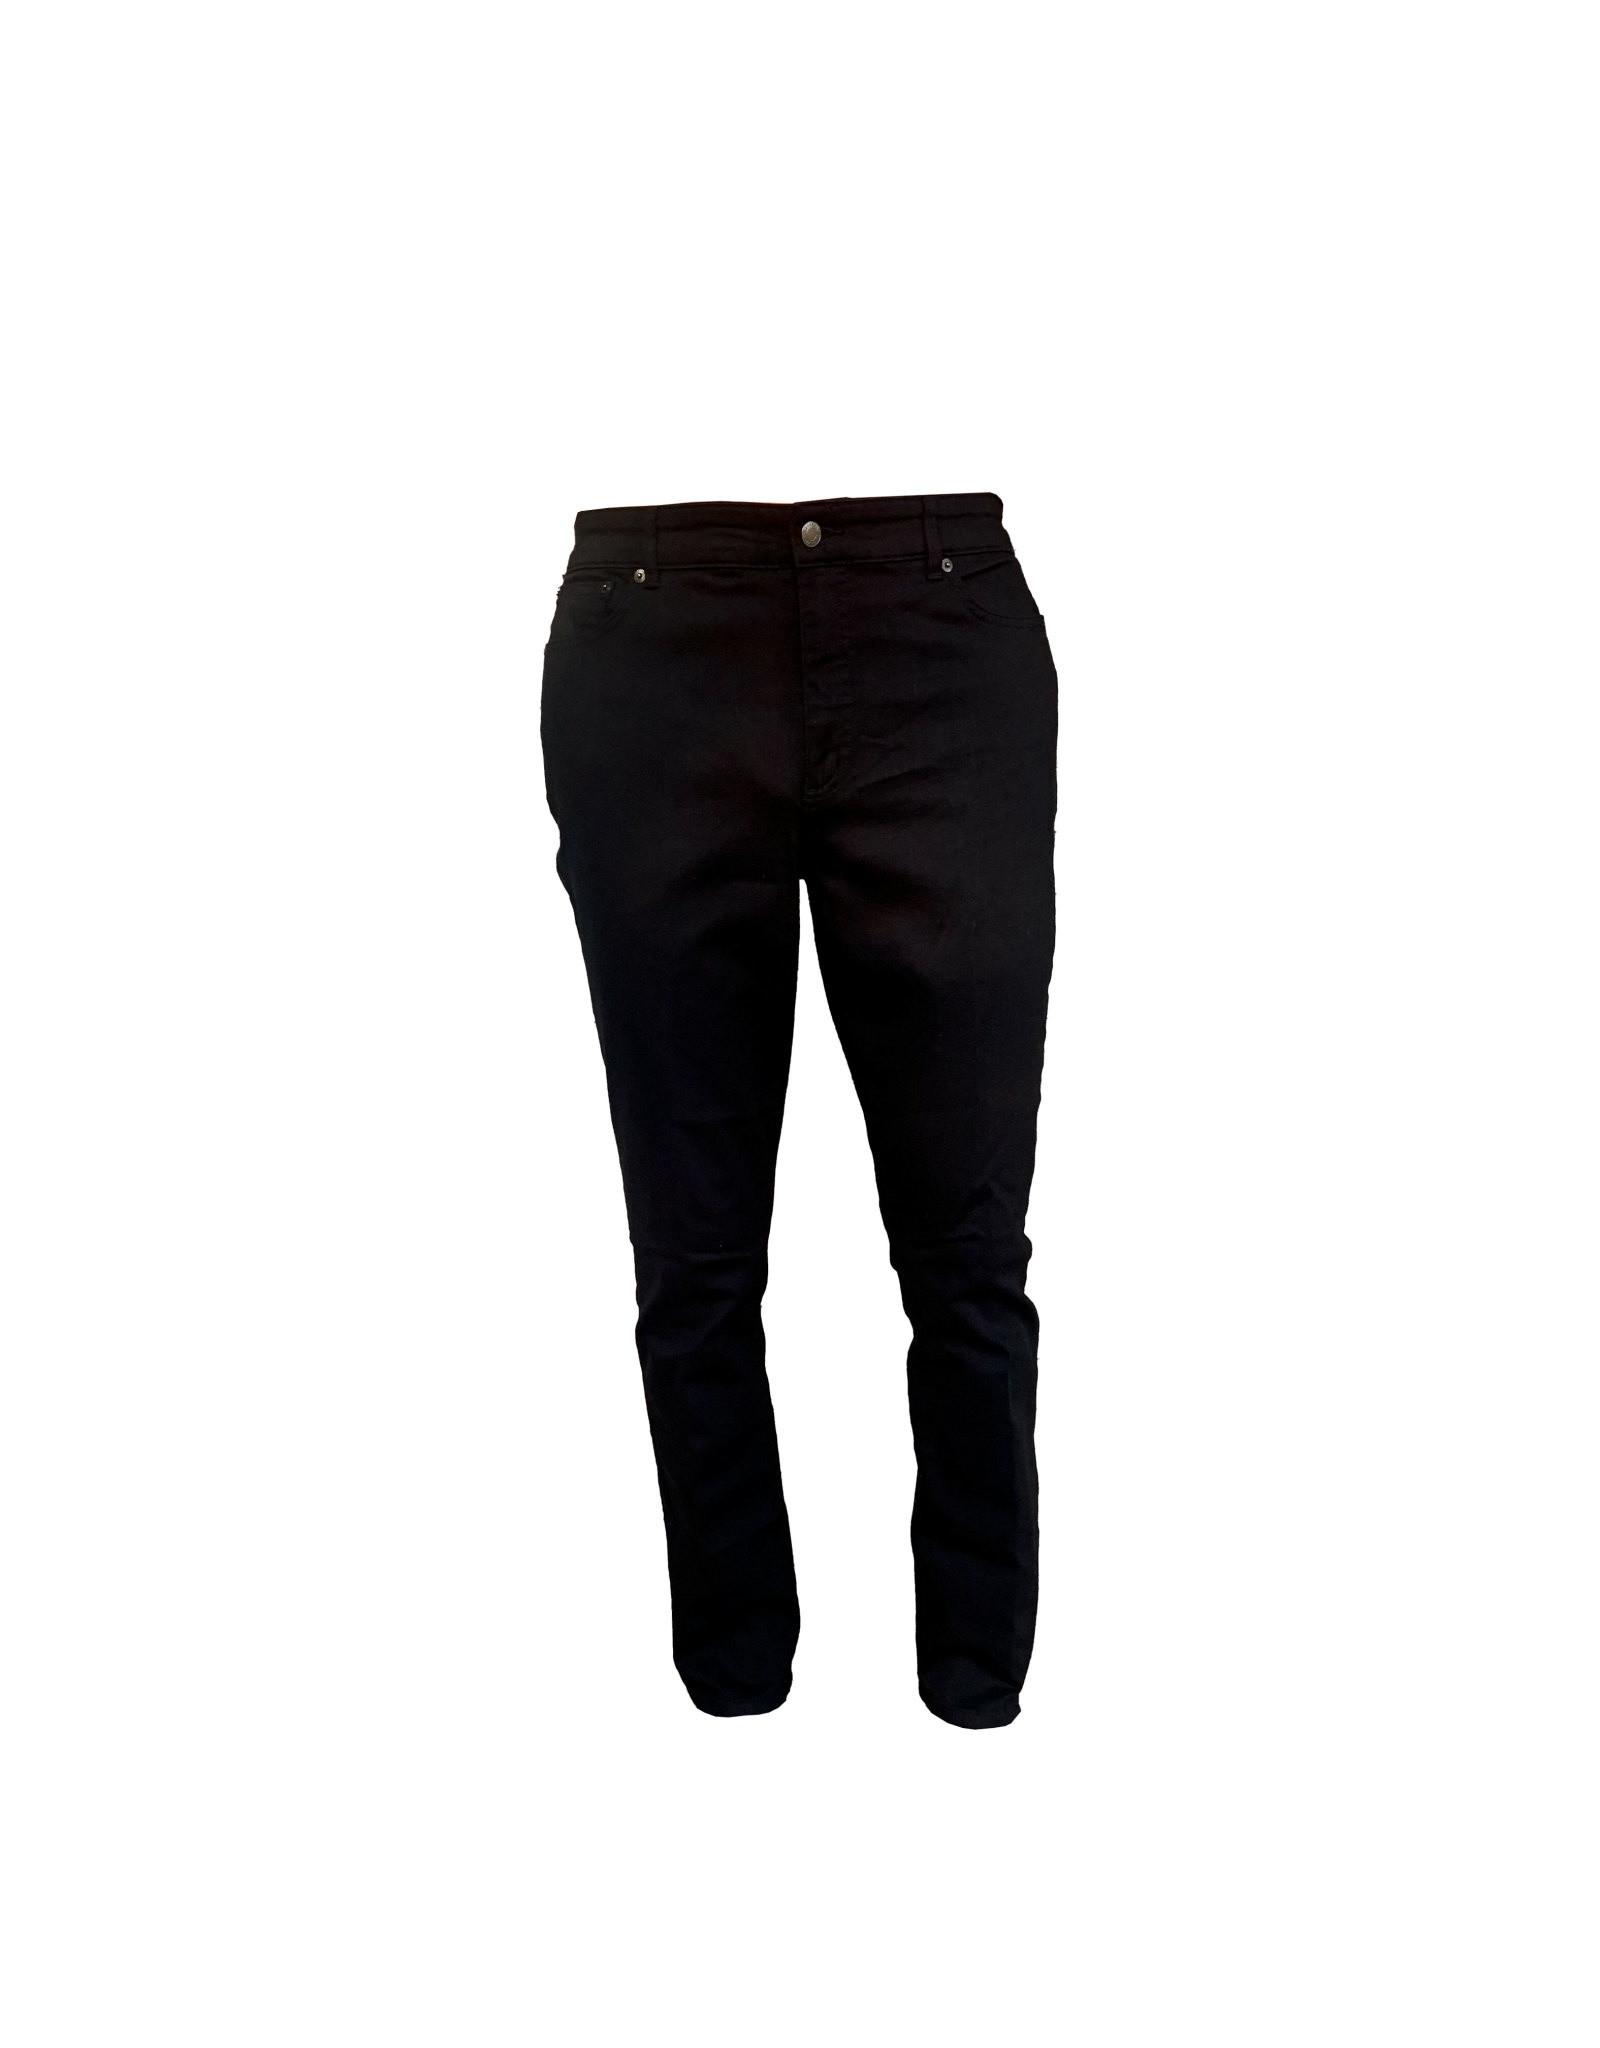 LAUREN RALPH LAUREN LAUREN RALPH LAUREN  Premier StraightLeg Jeans size 14